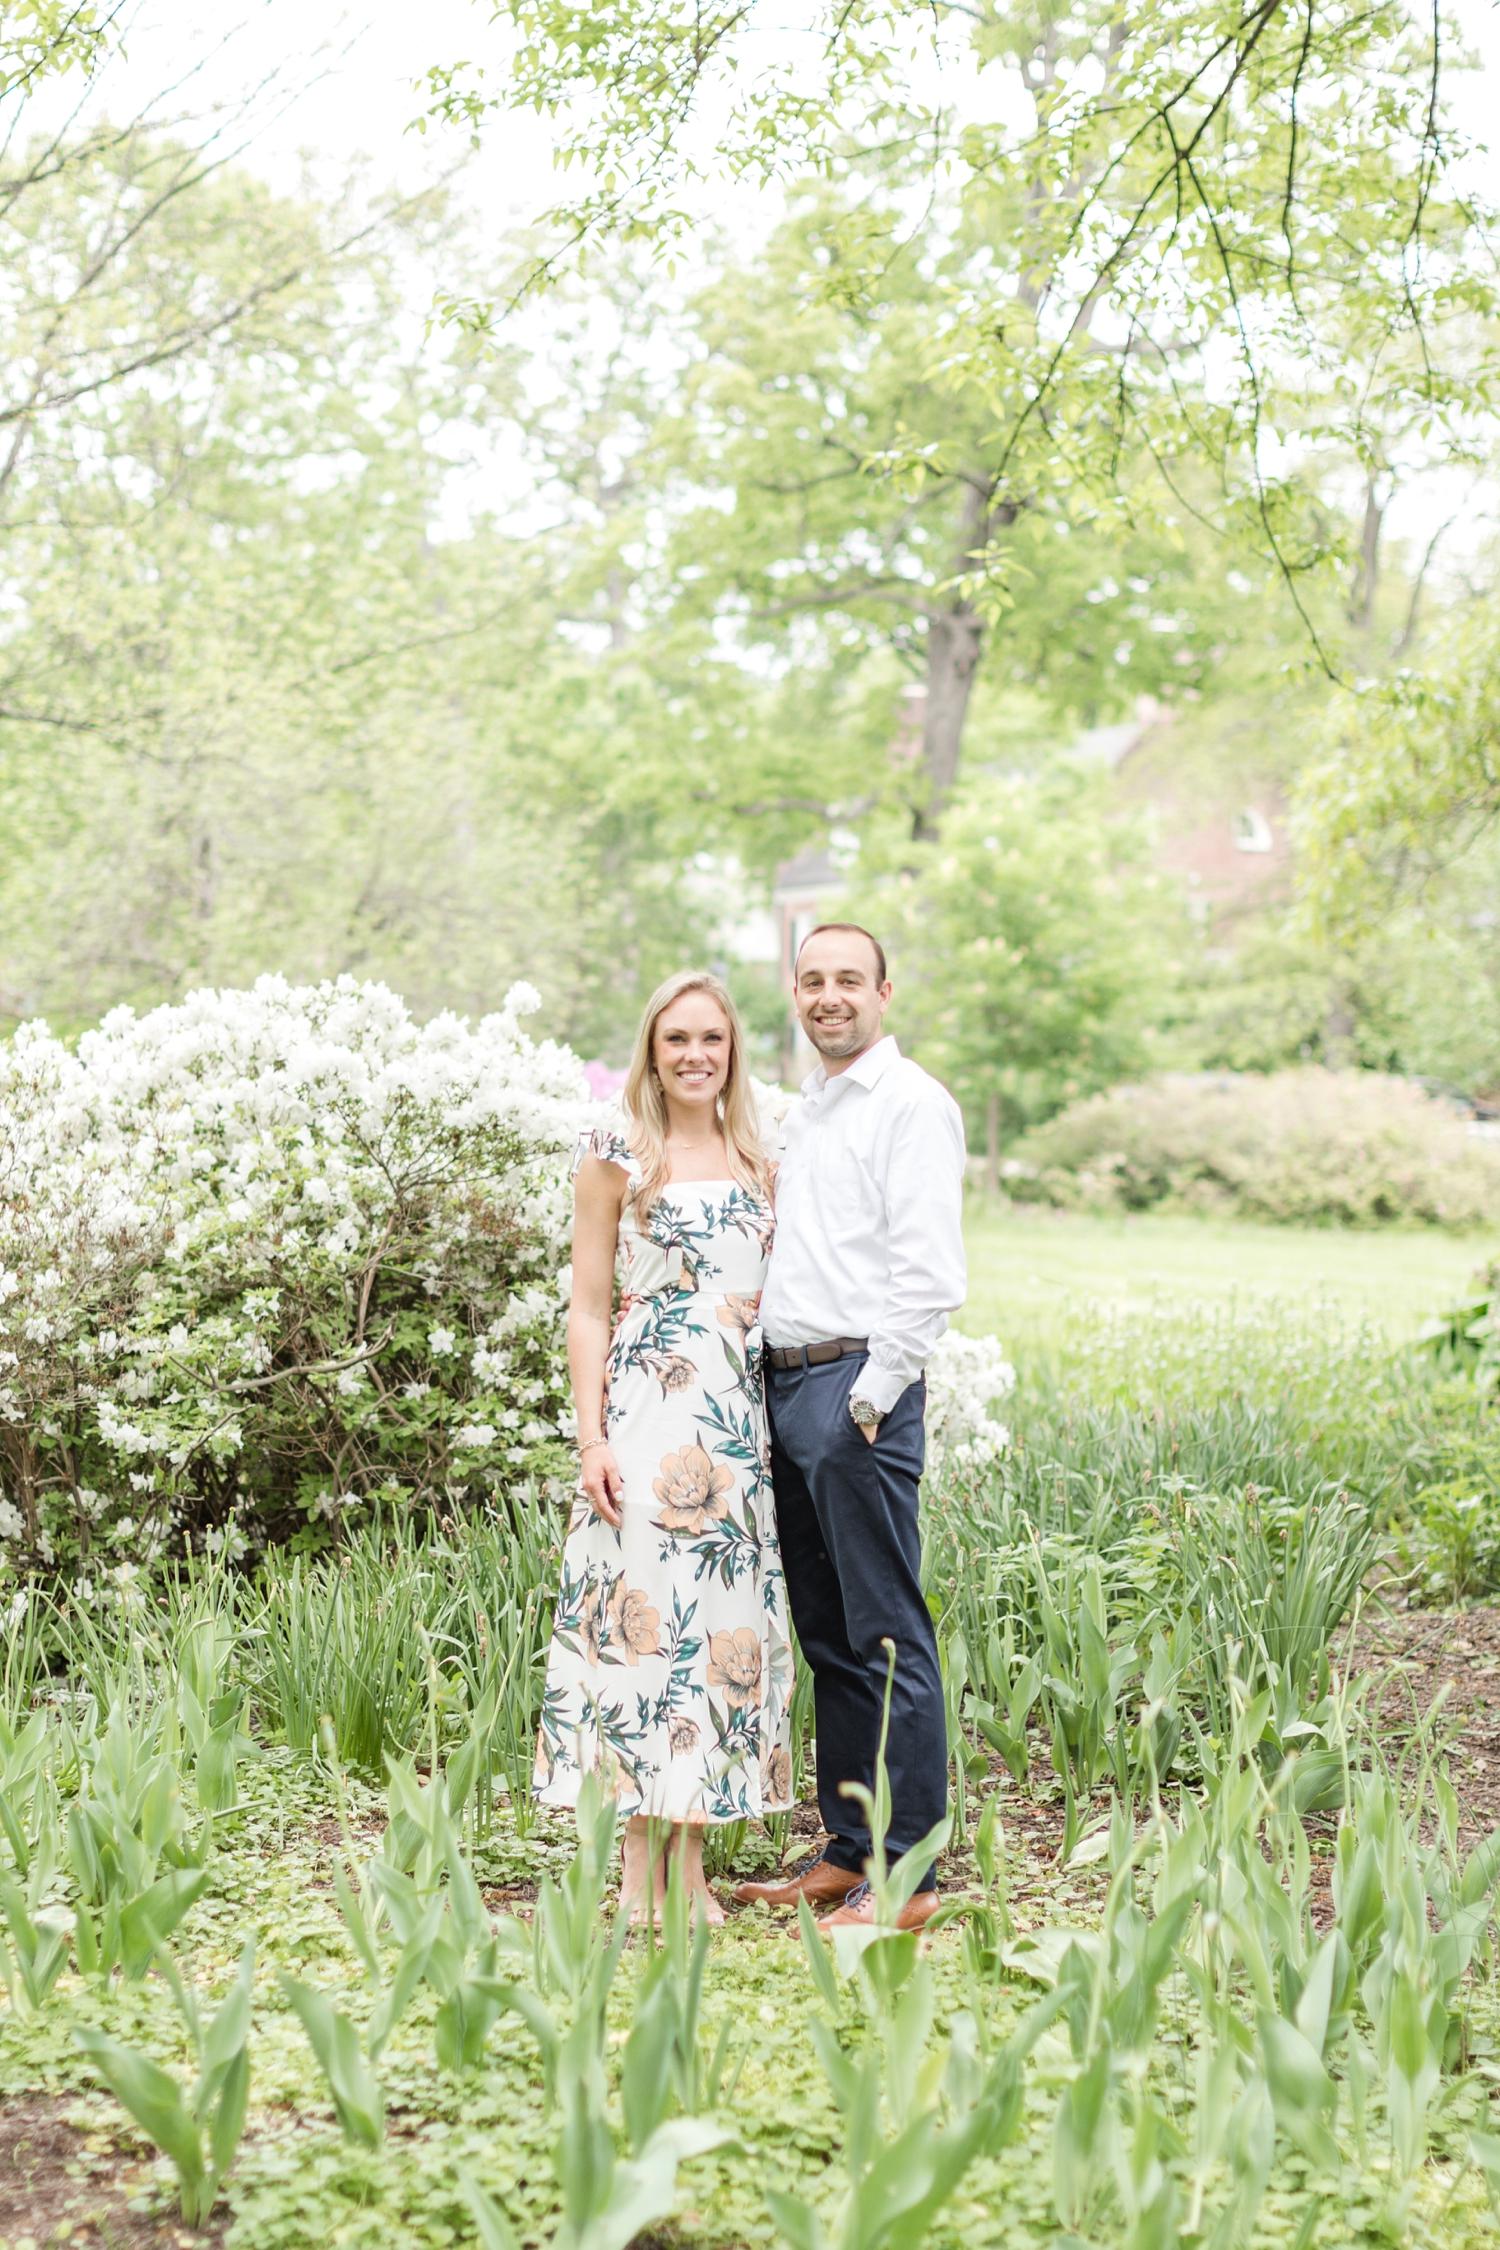 Maddy and Lloyd Engagement-168_Baltimore-Maryland-engagement-photography-Sherwood-Gardens-Maryland-engagement-photographer-anna-grace-photography-photo.jpg